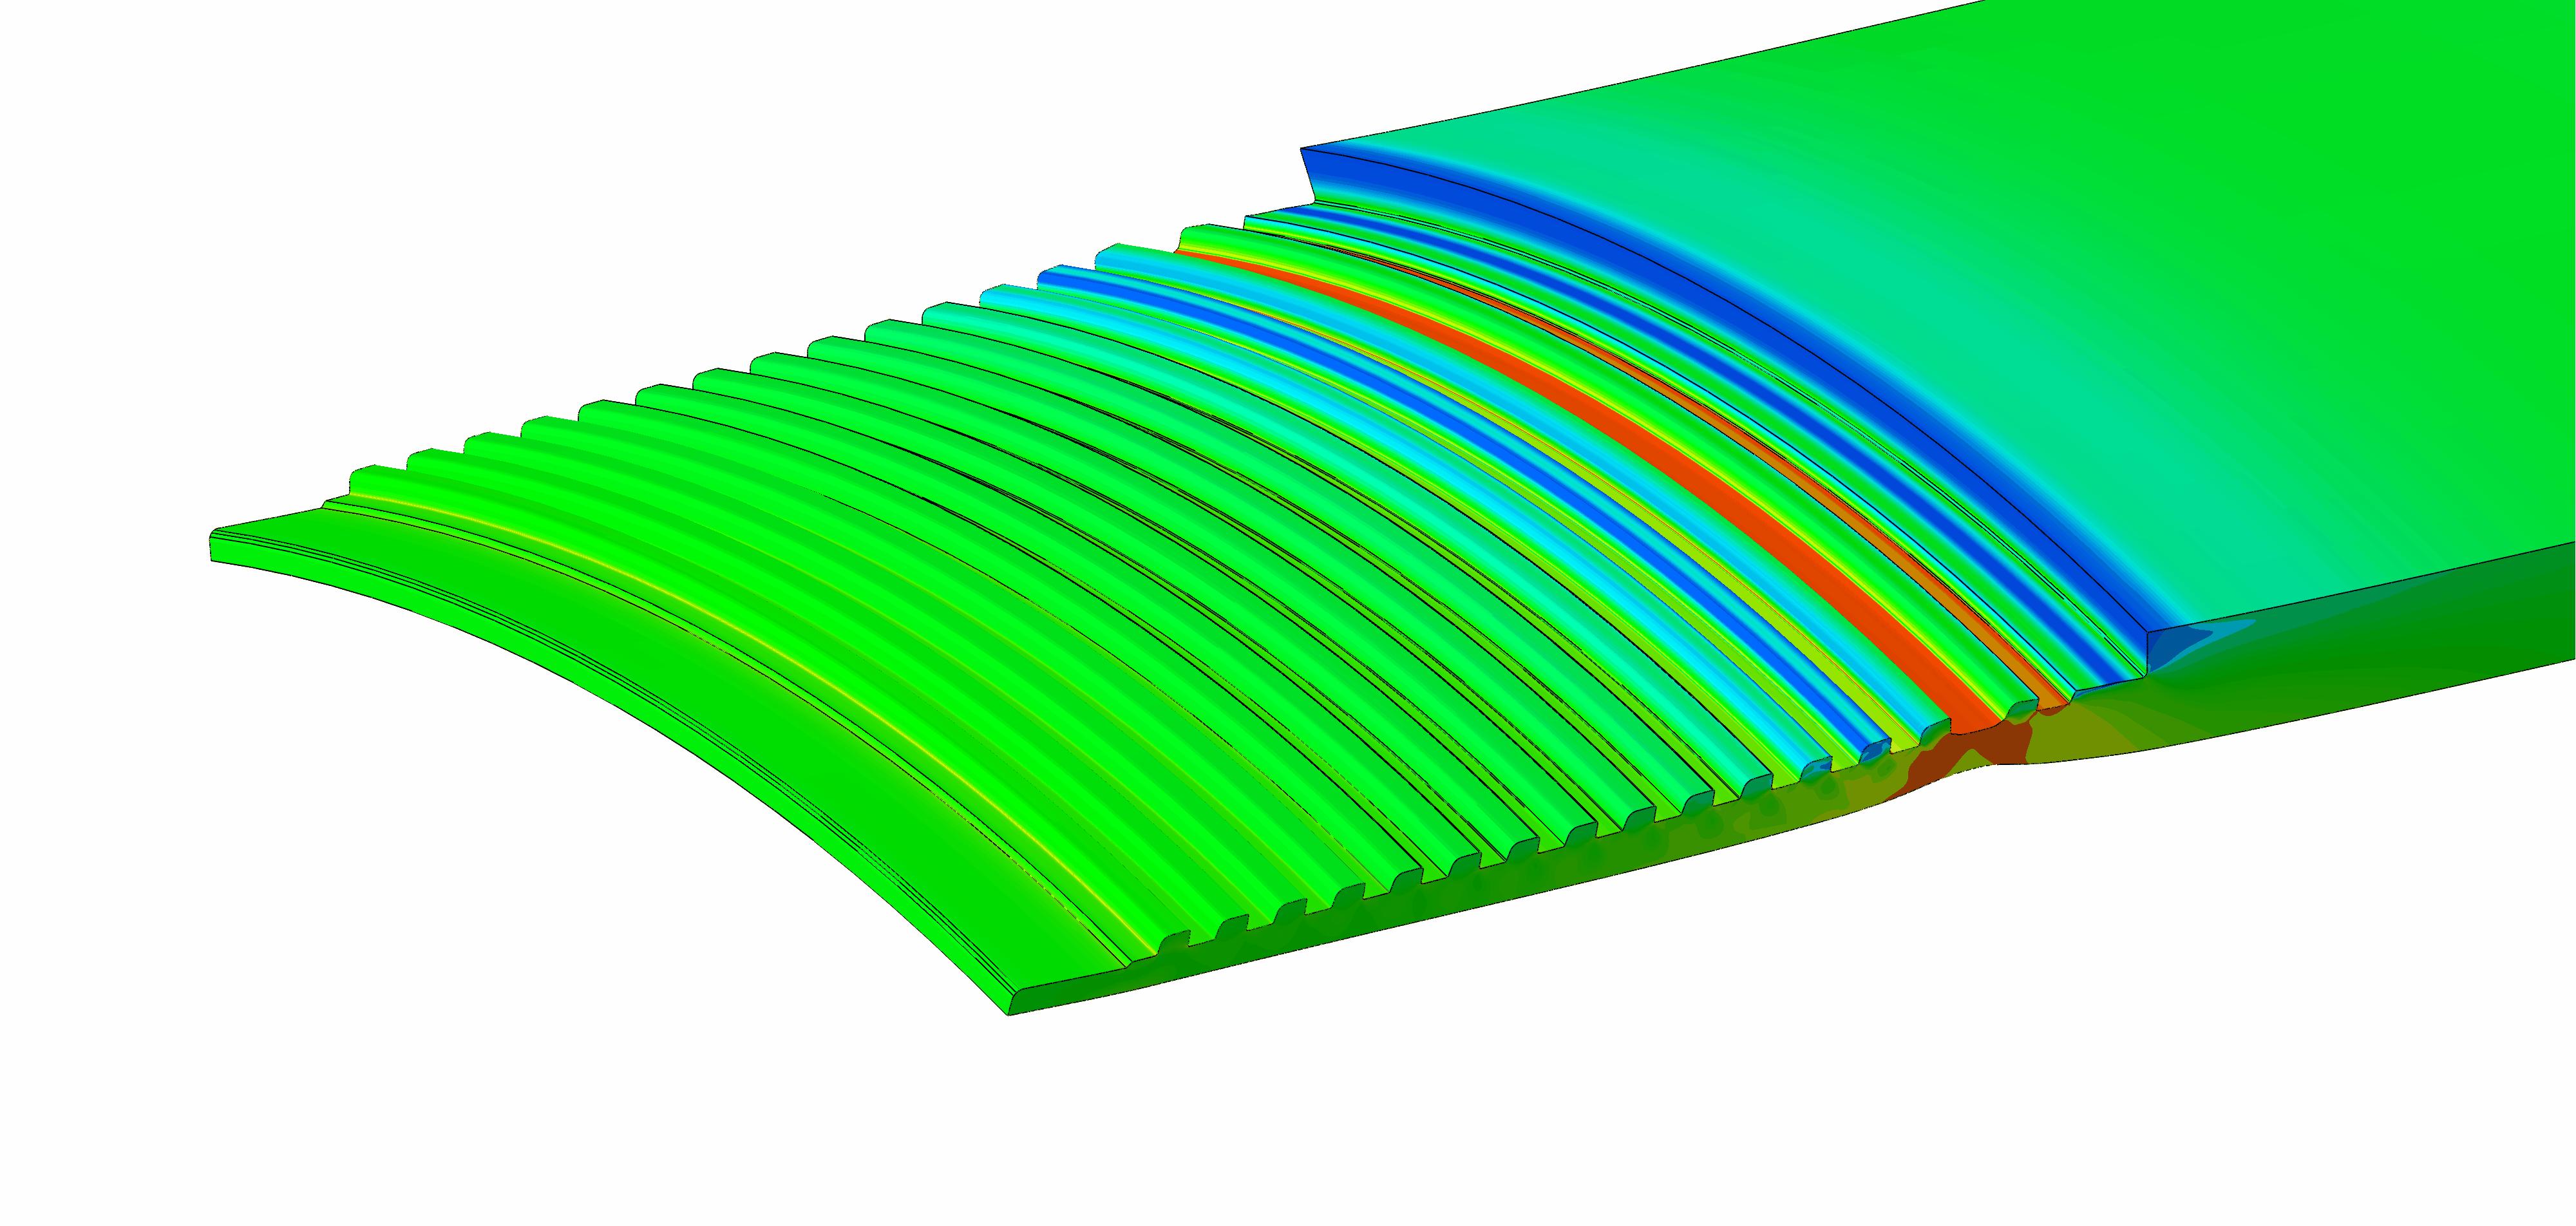 Axial Load Capacity of Proprietary Buttress Thread | FE